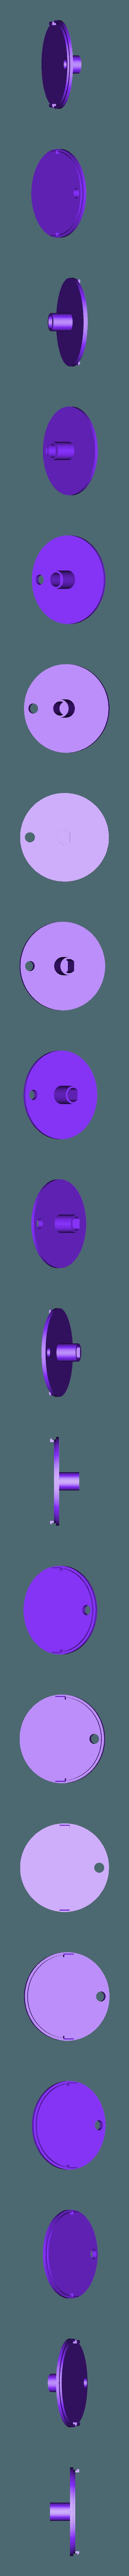 GPS_Dome_Bottom.stl Download free STL file Experimental Multirotor • 3D printable model, SeanTheITGuy